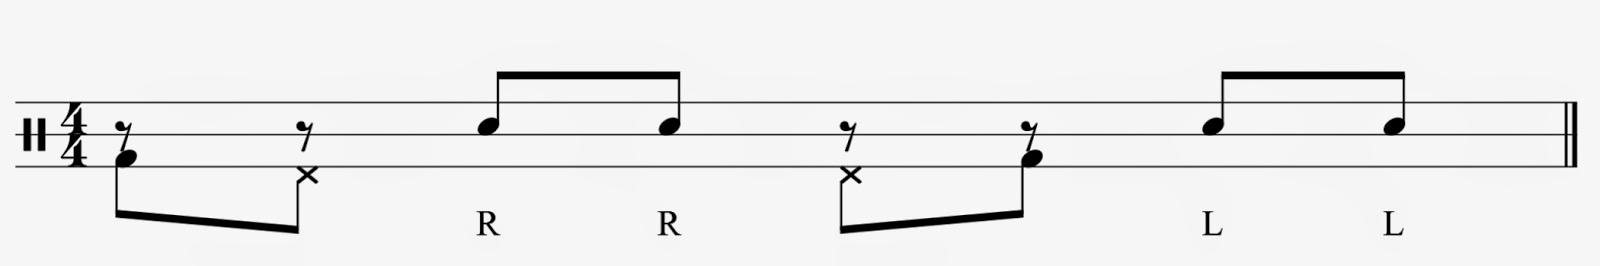 variacion paraddidle navarro